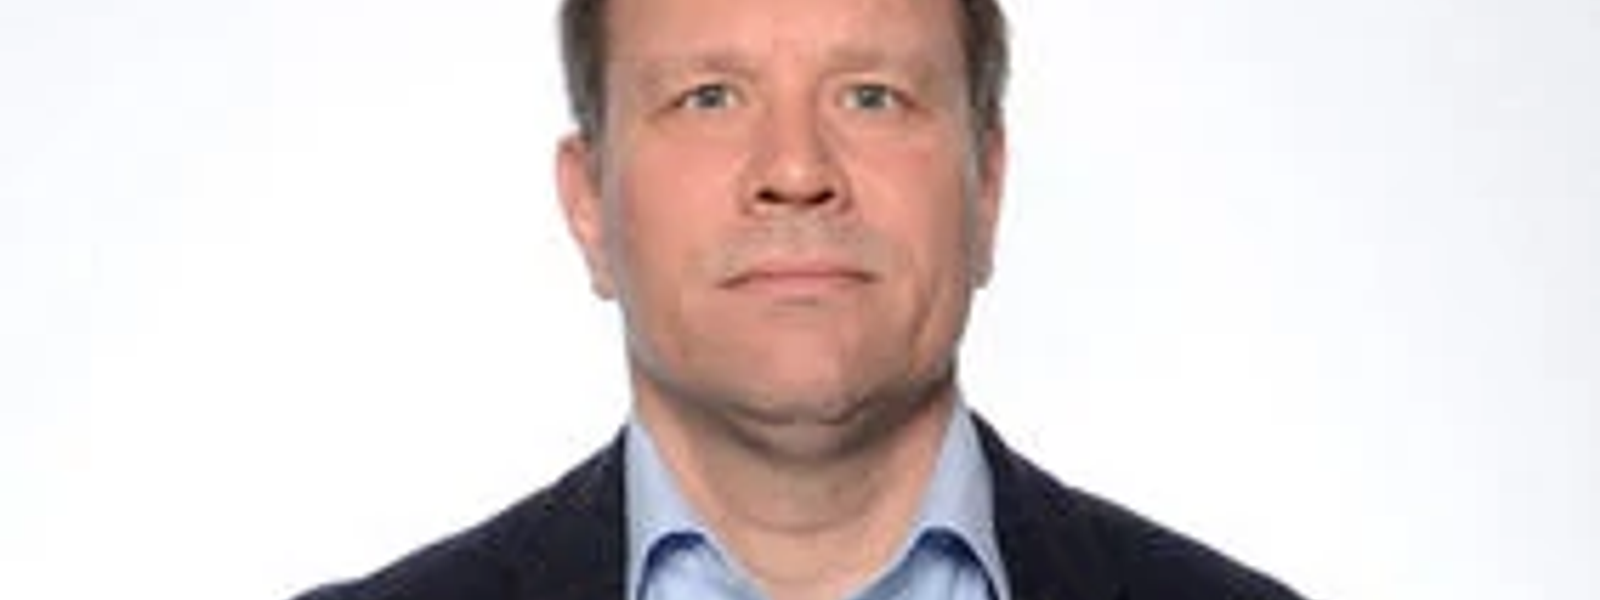 Petter Linden